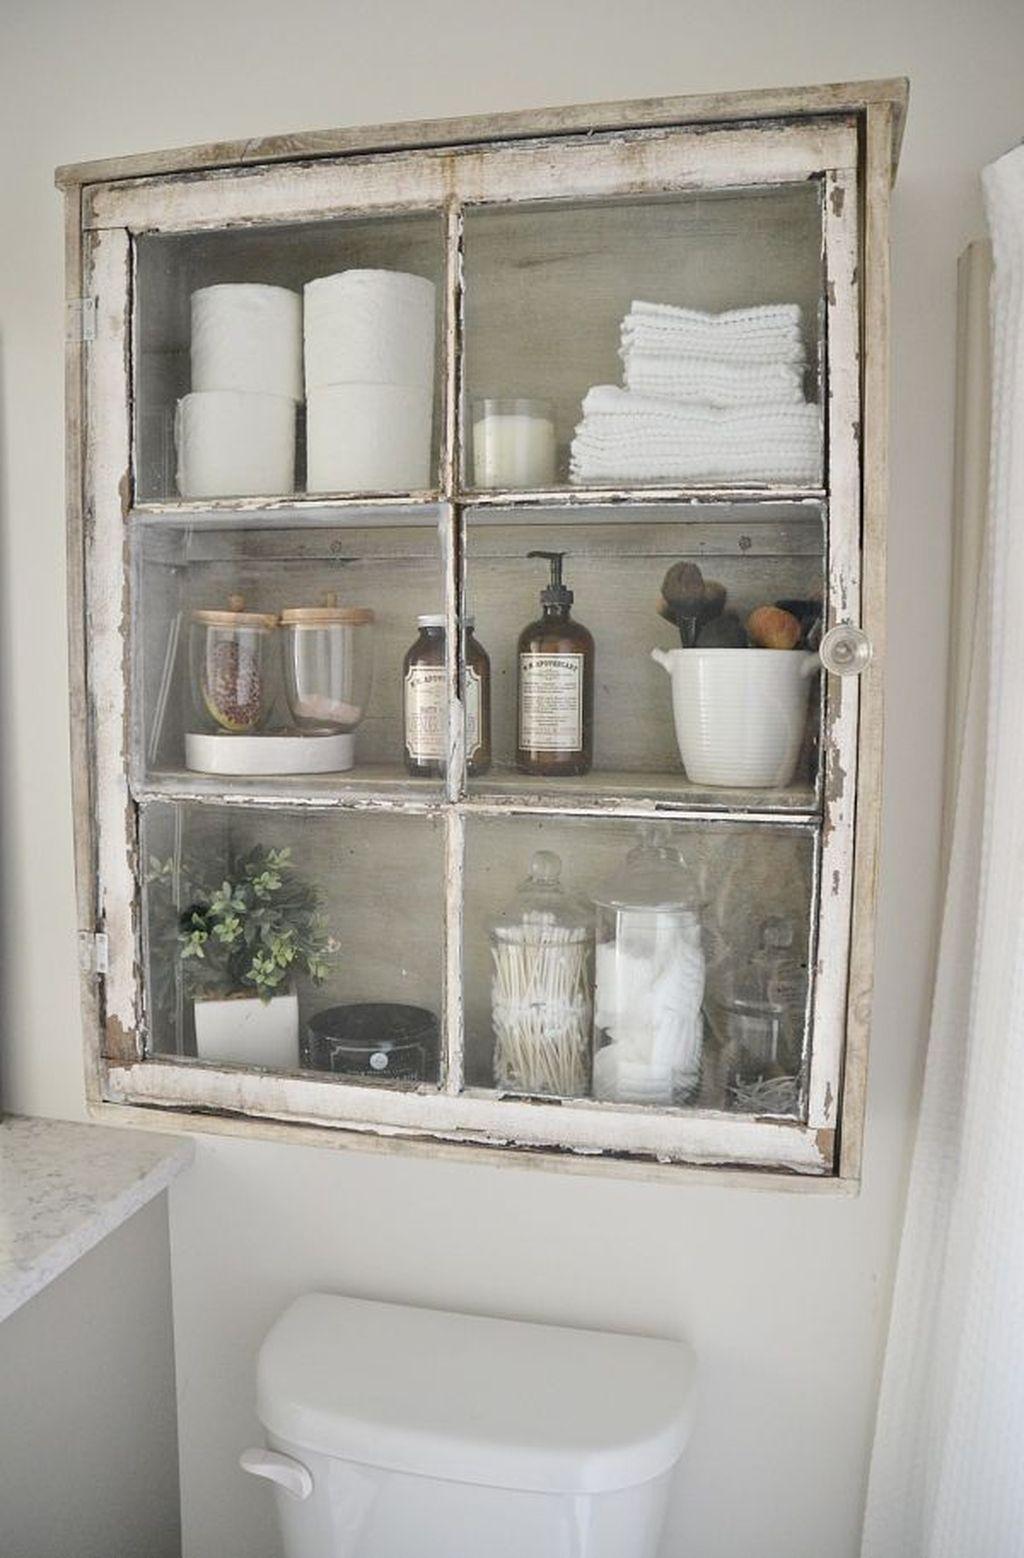 Affordable Diy Bathroom Storage Ideas For Small Spaces 24